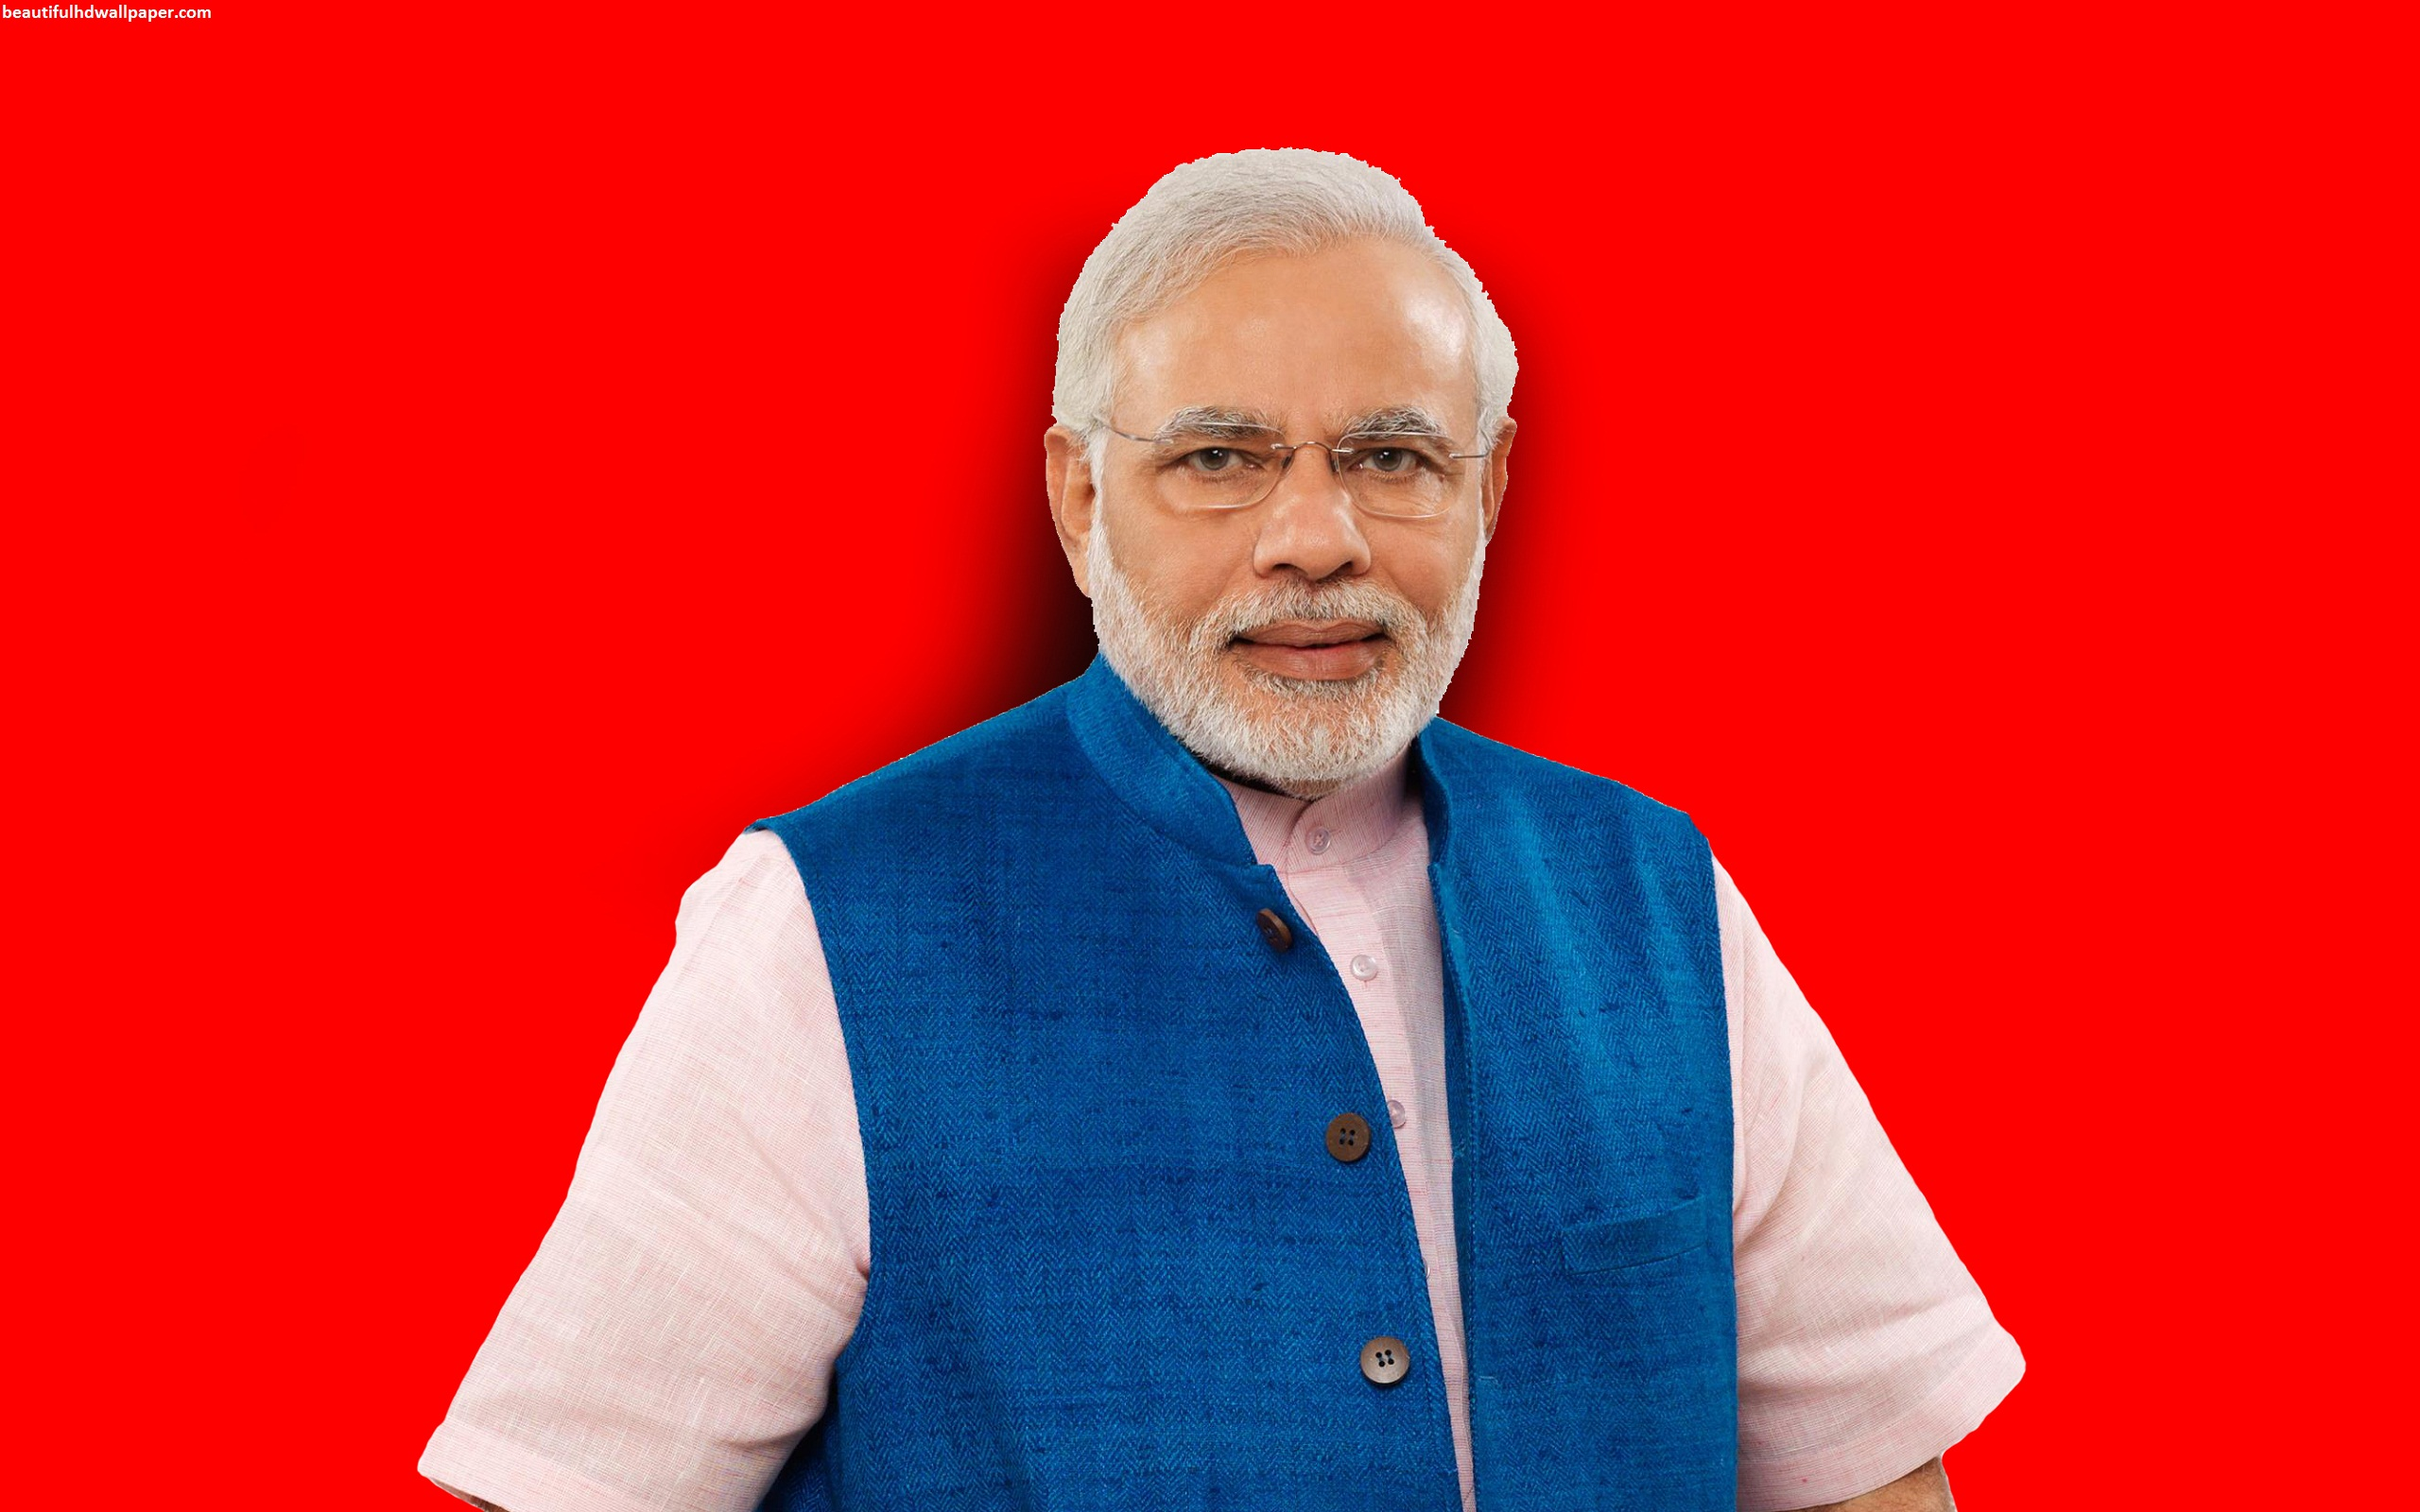 Birla-Sahara diaries: Supreme Court refuses probe into alleged payoffs to Pm Narendra Modi